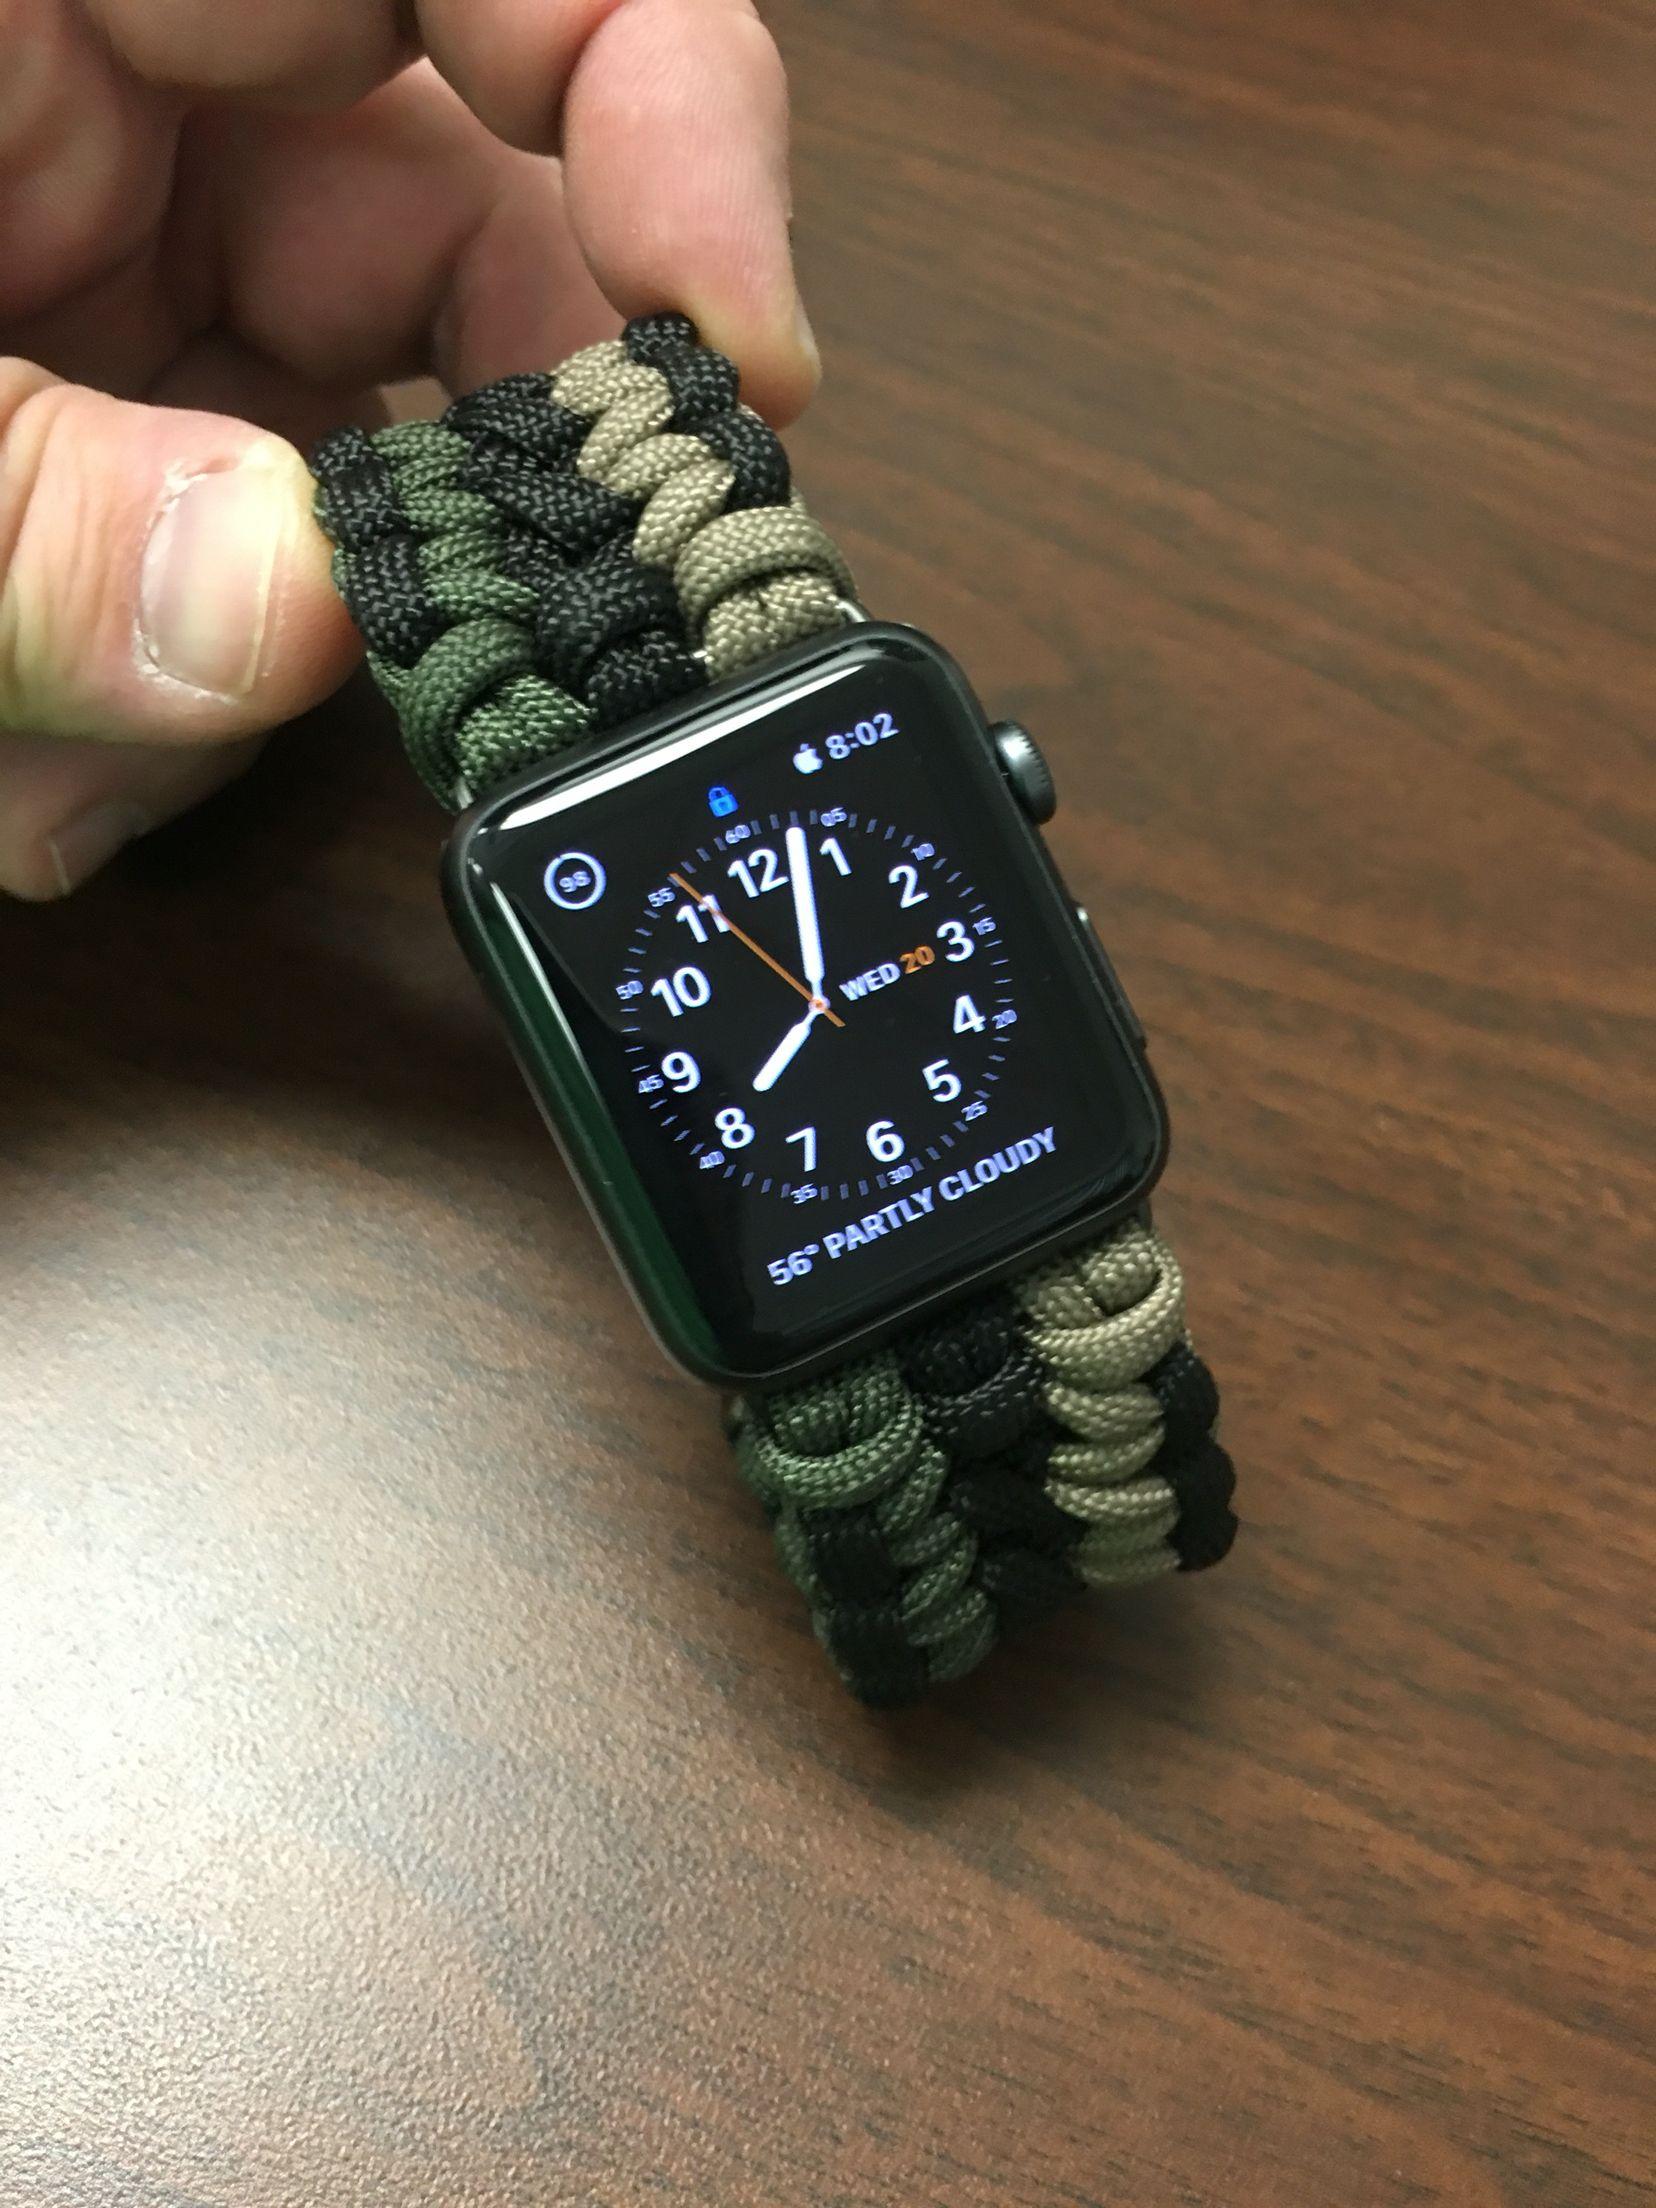 Apple Watch Band Apple Watch Bands Apple Watch Watch Bands